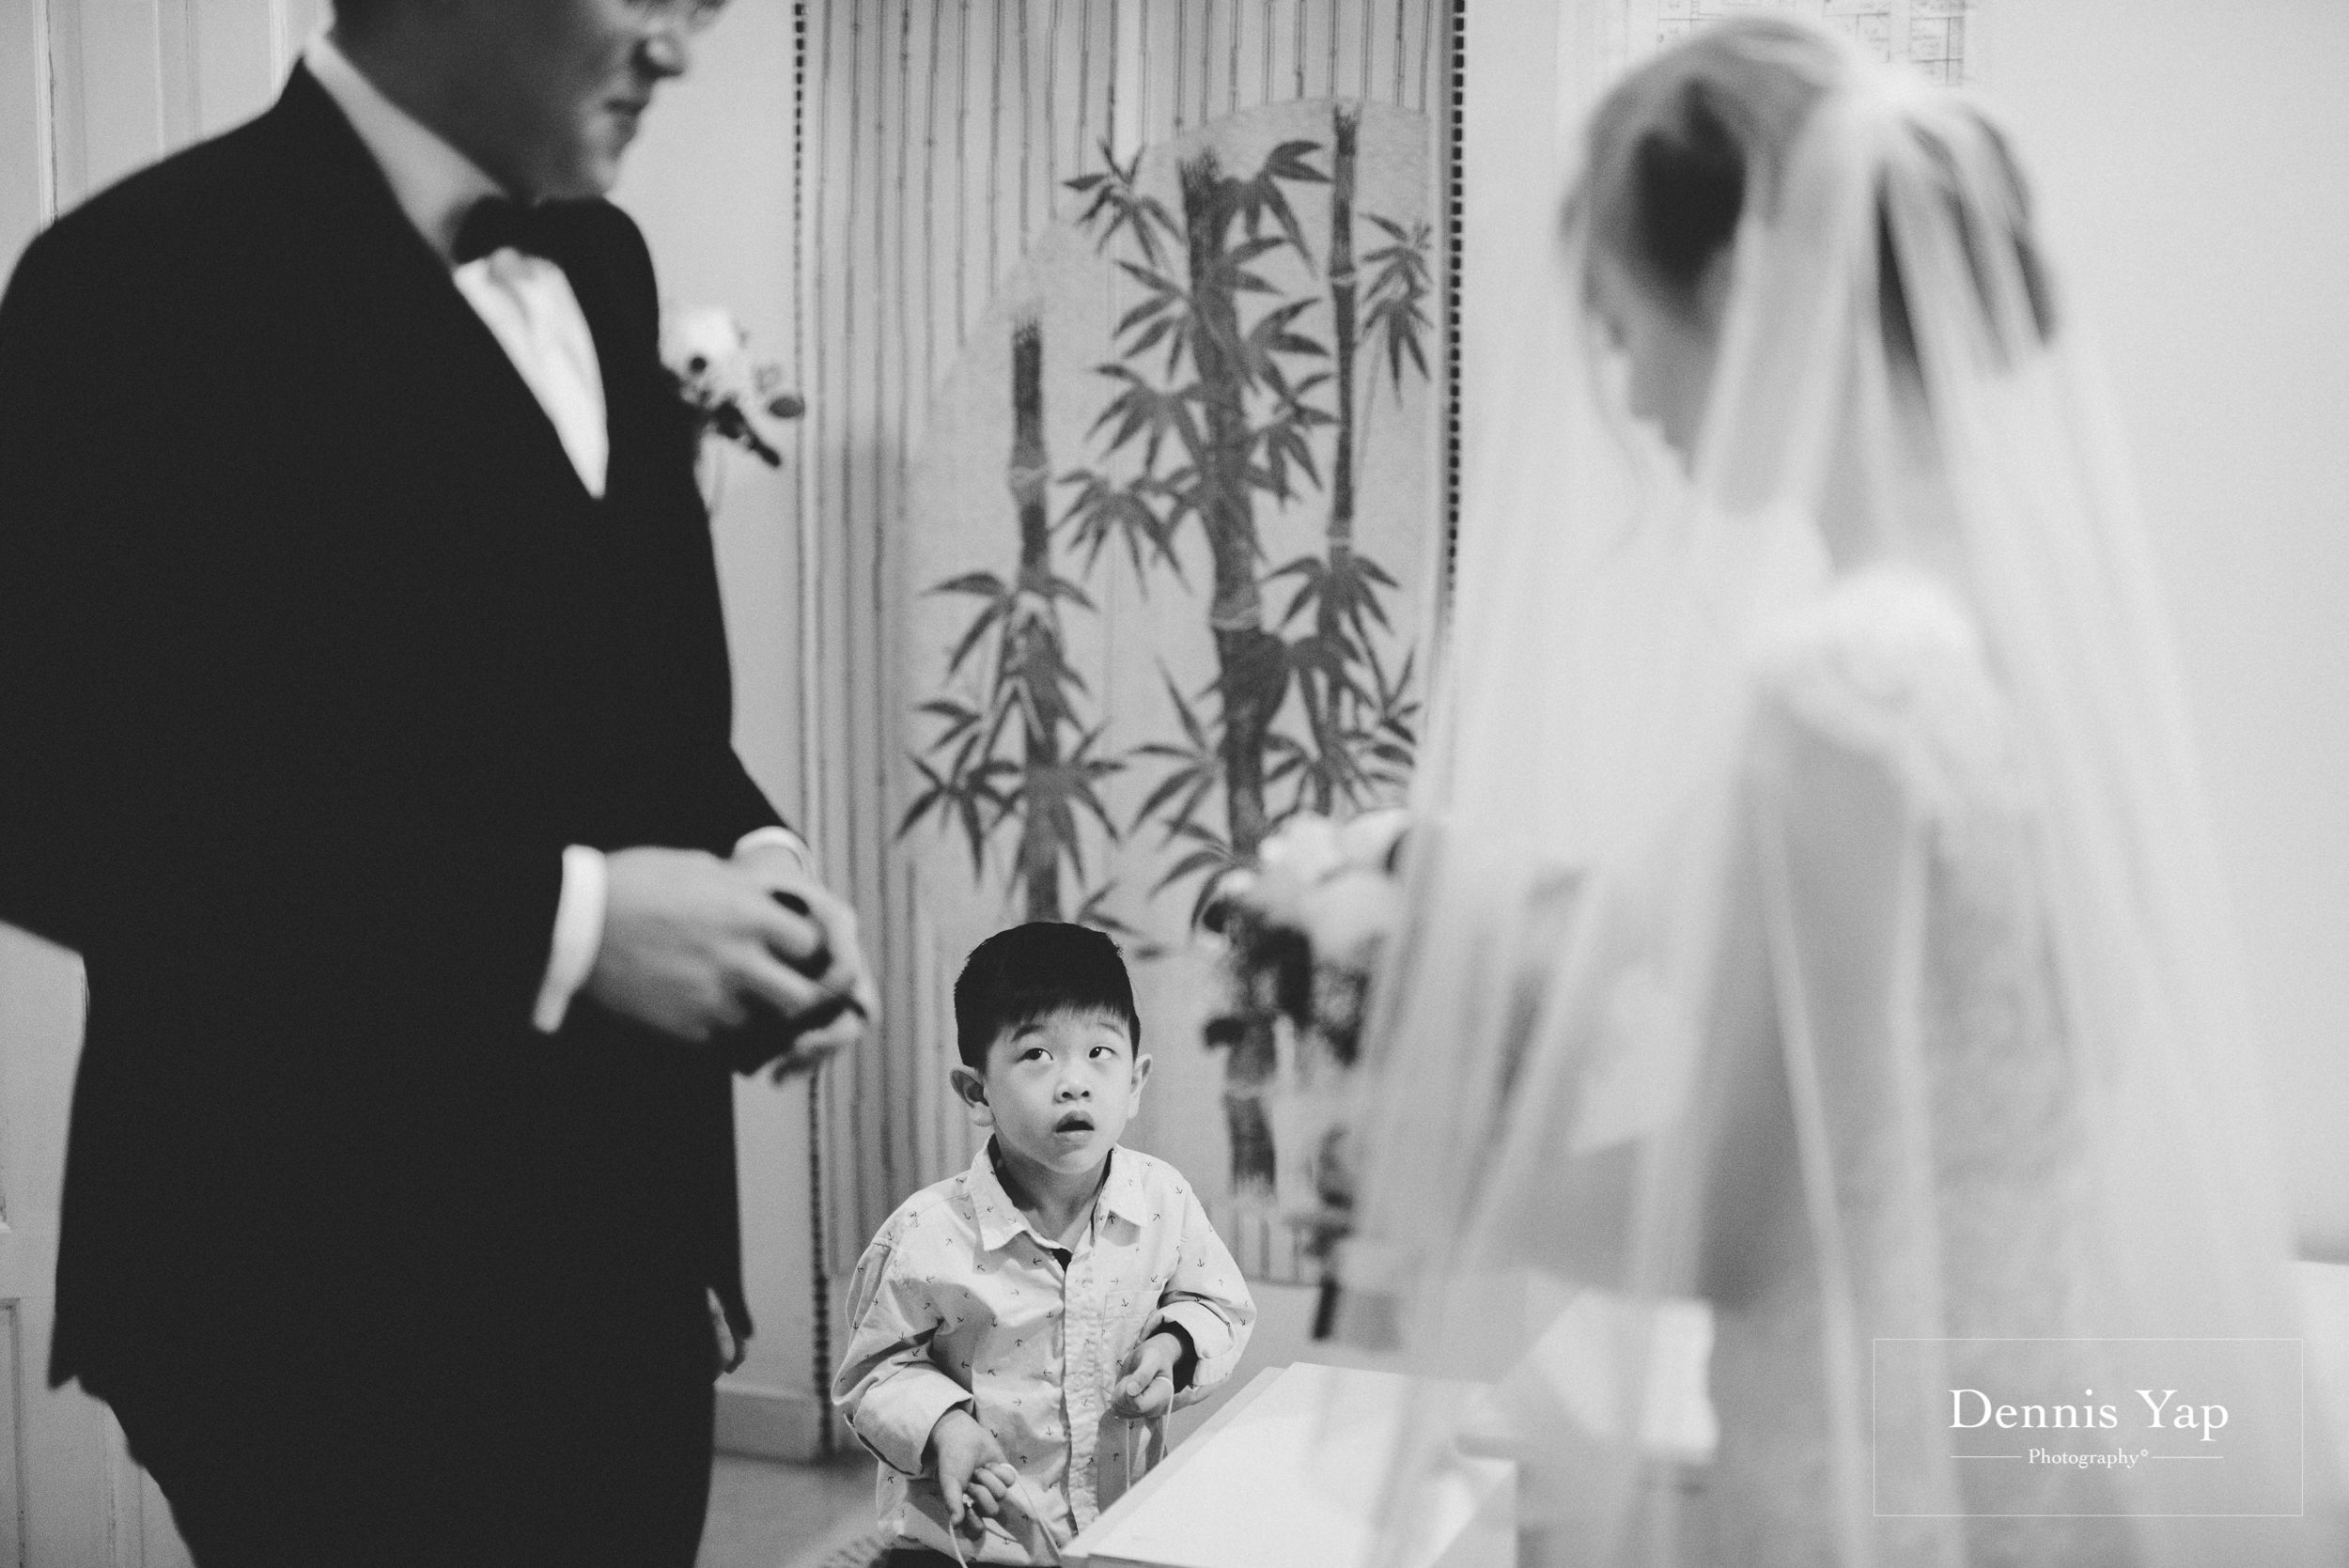 chuan wai angela wedding day bukit jelutong selangor malaysia dennis yap photography-4.jpg